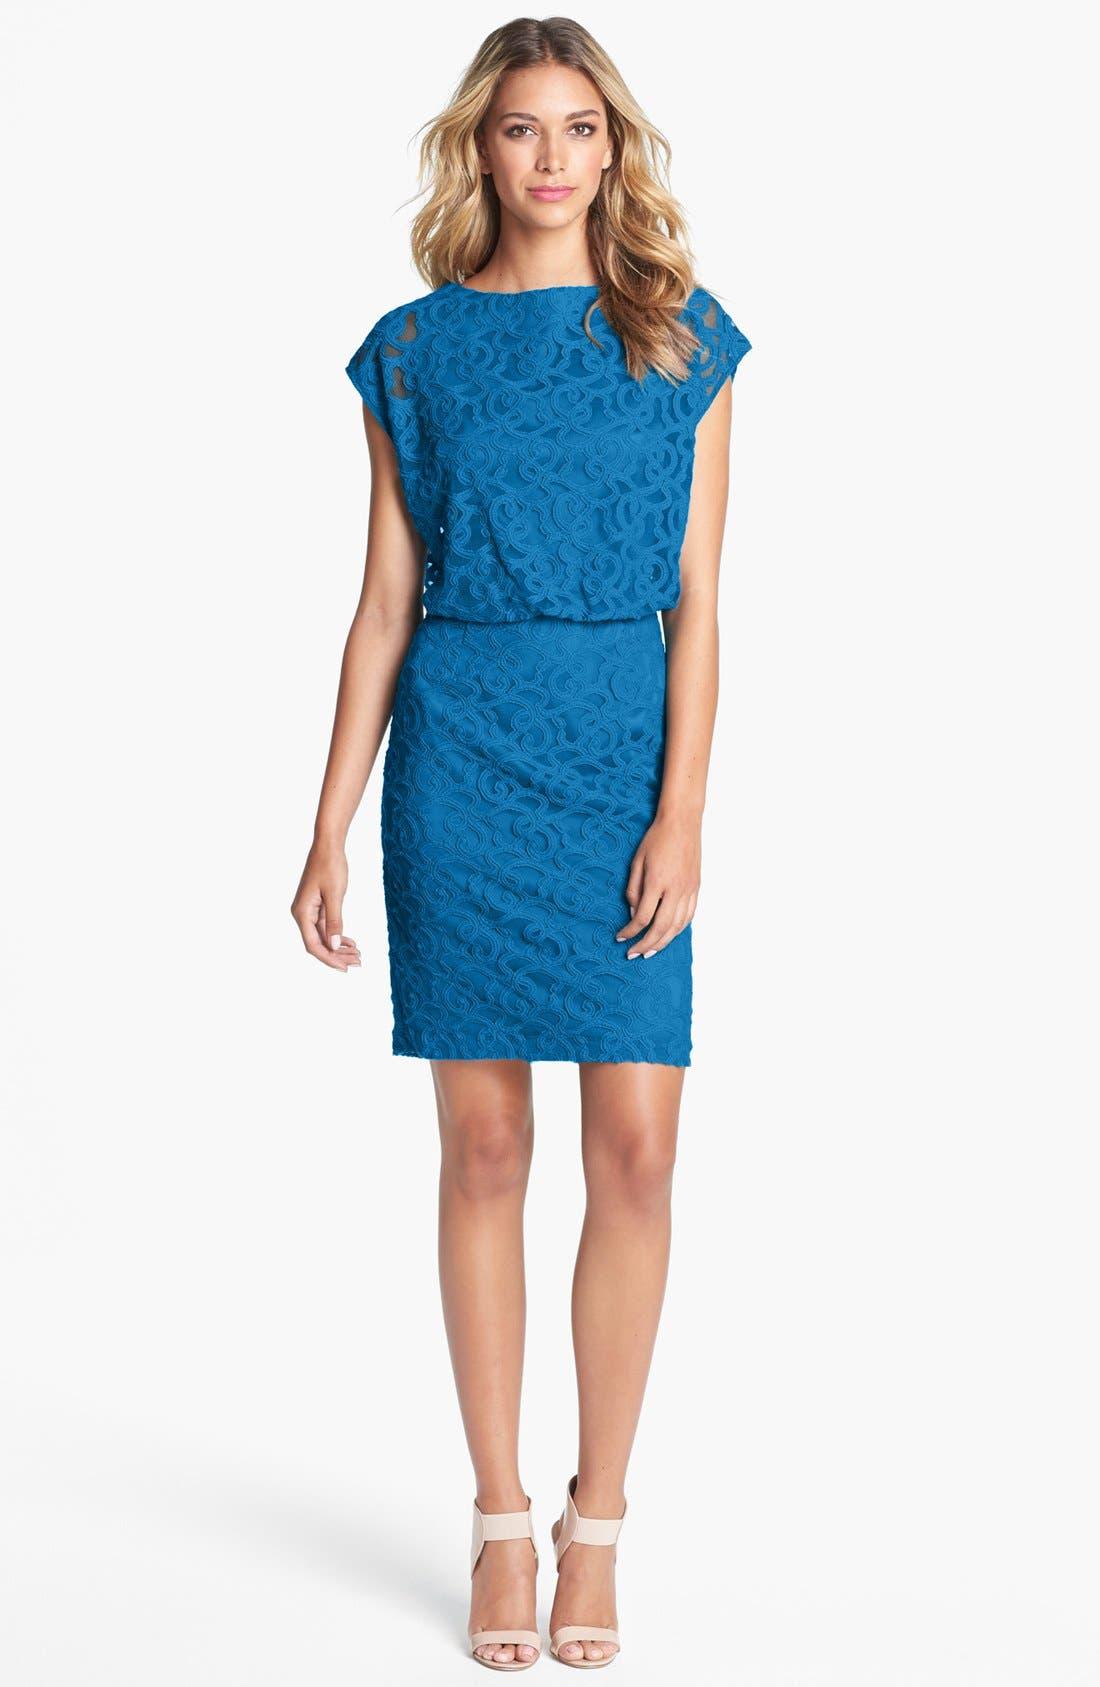 Main Image - Adrianna Papell Lace Blouson Dress (Petite)